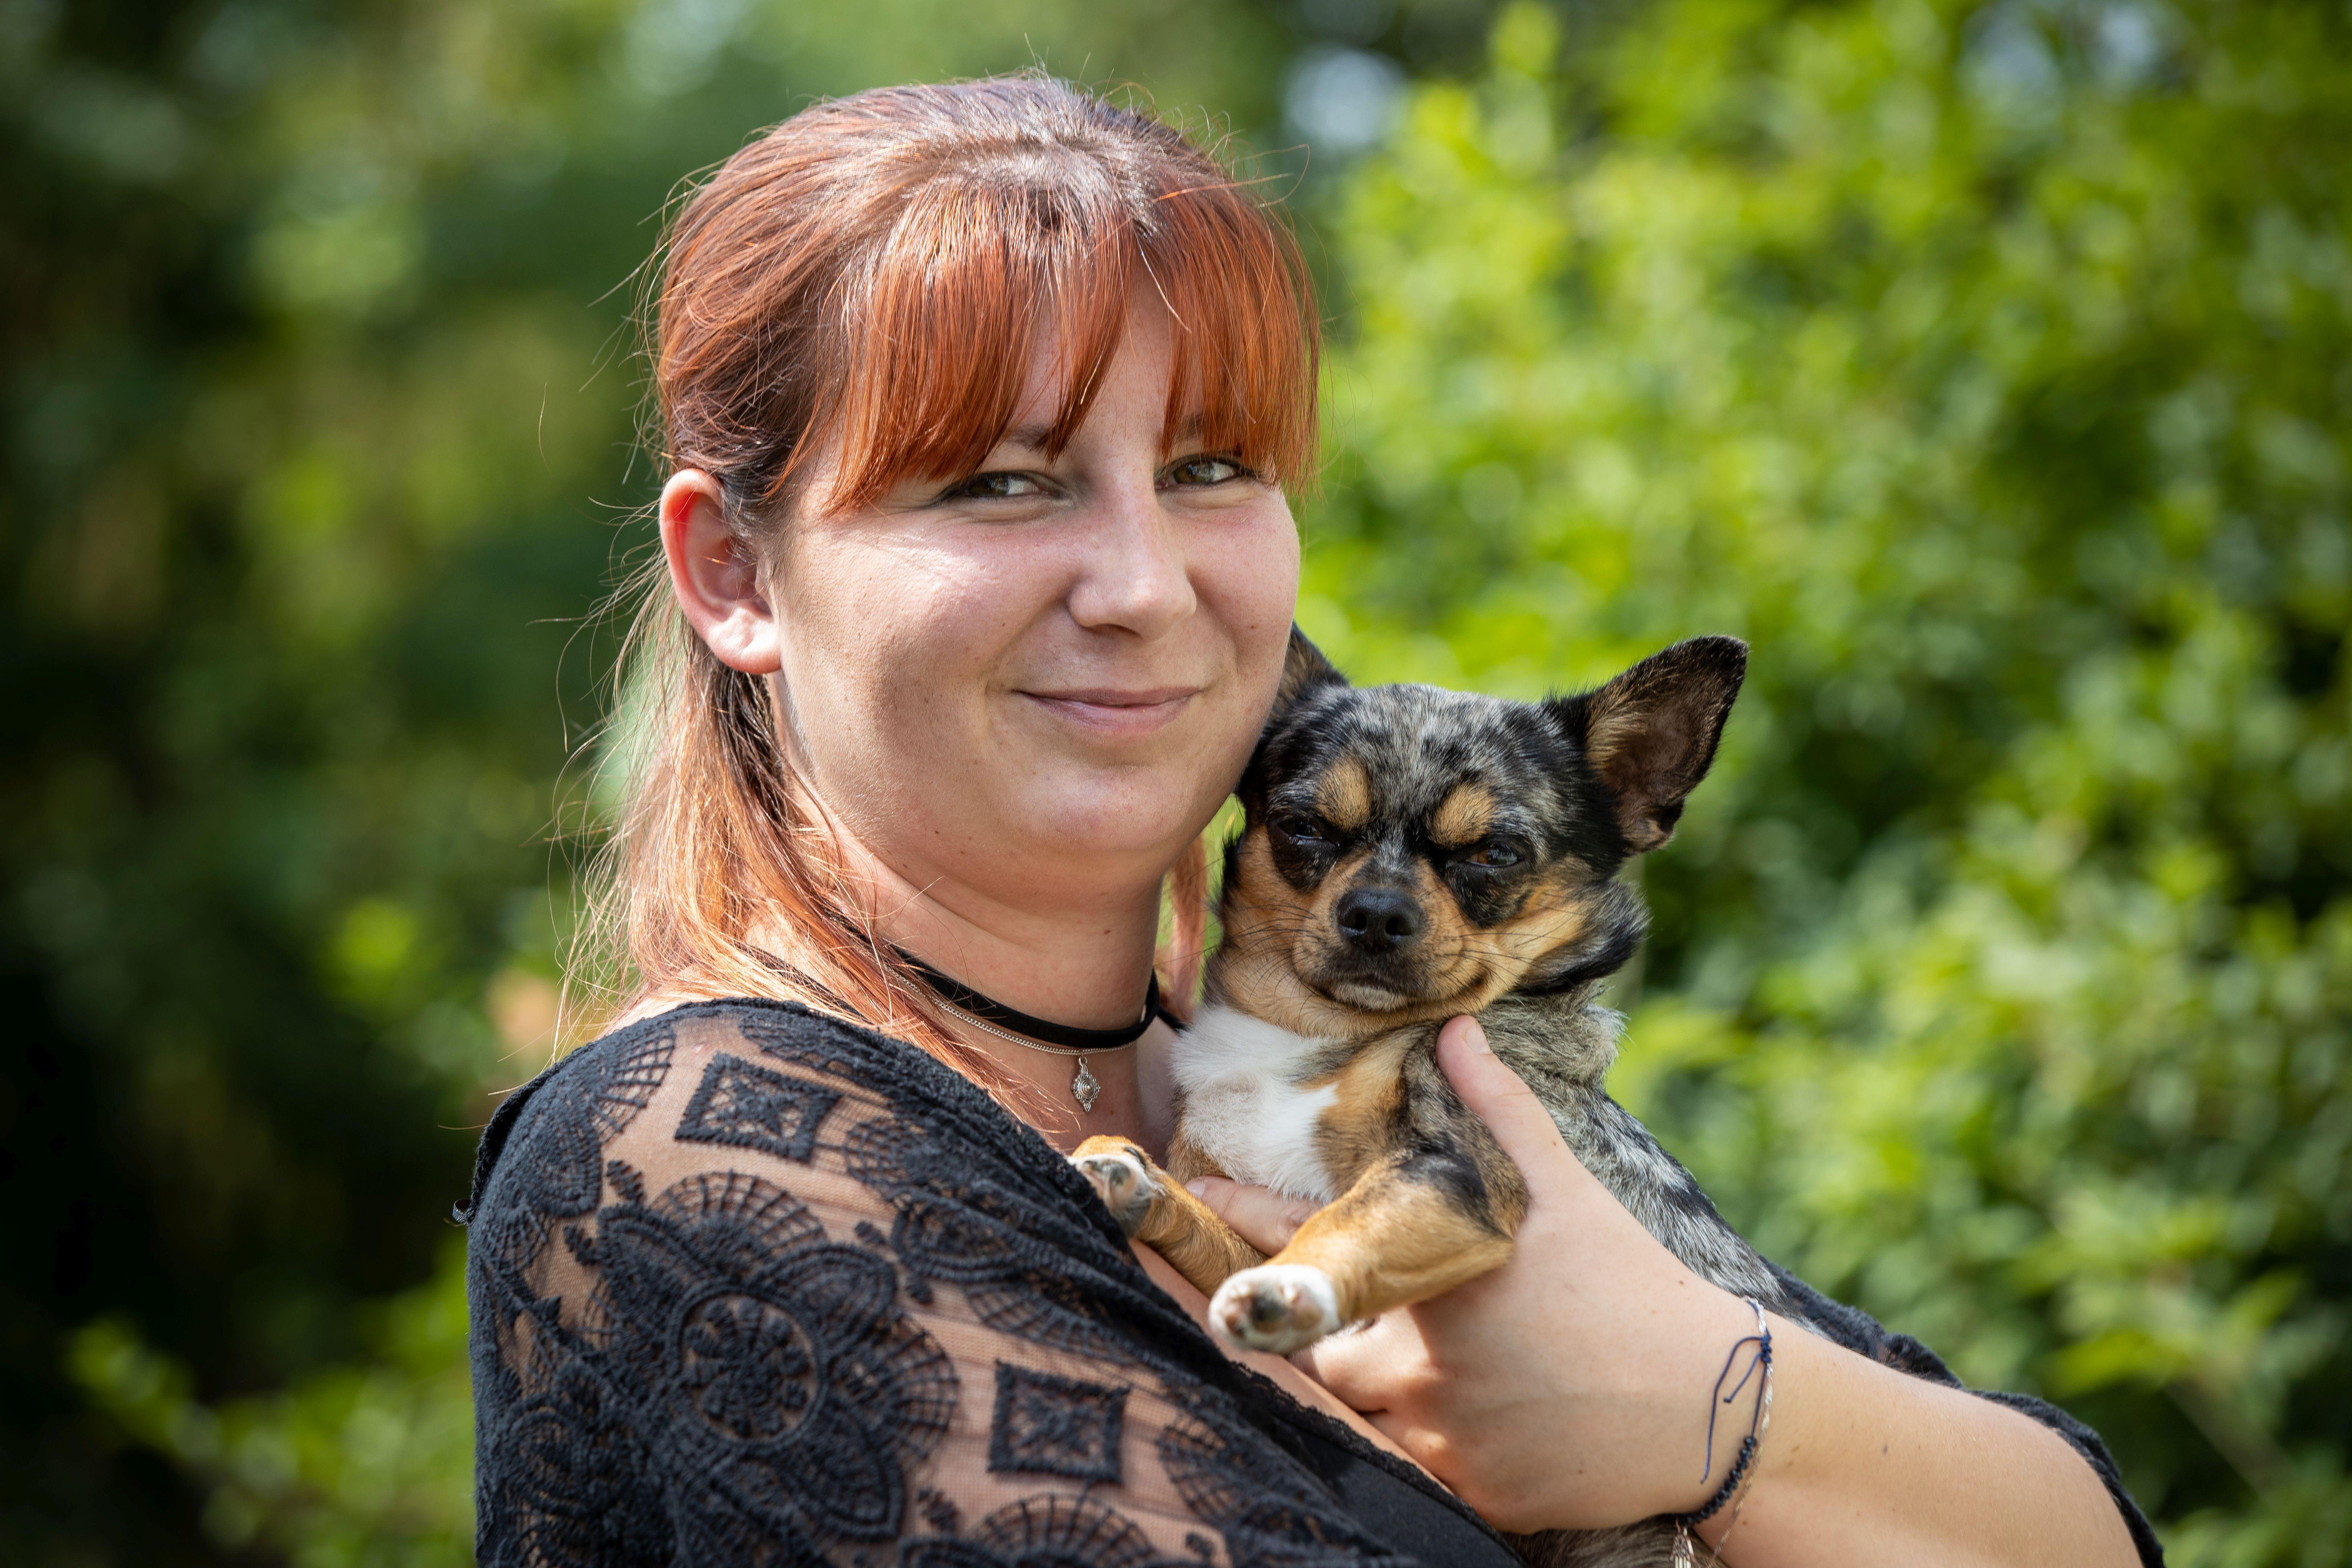 Frau Sucht Mann in Waiblingen - Bekanntschaften - Quoka